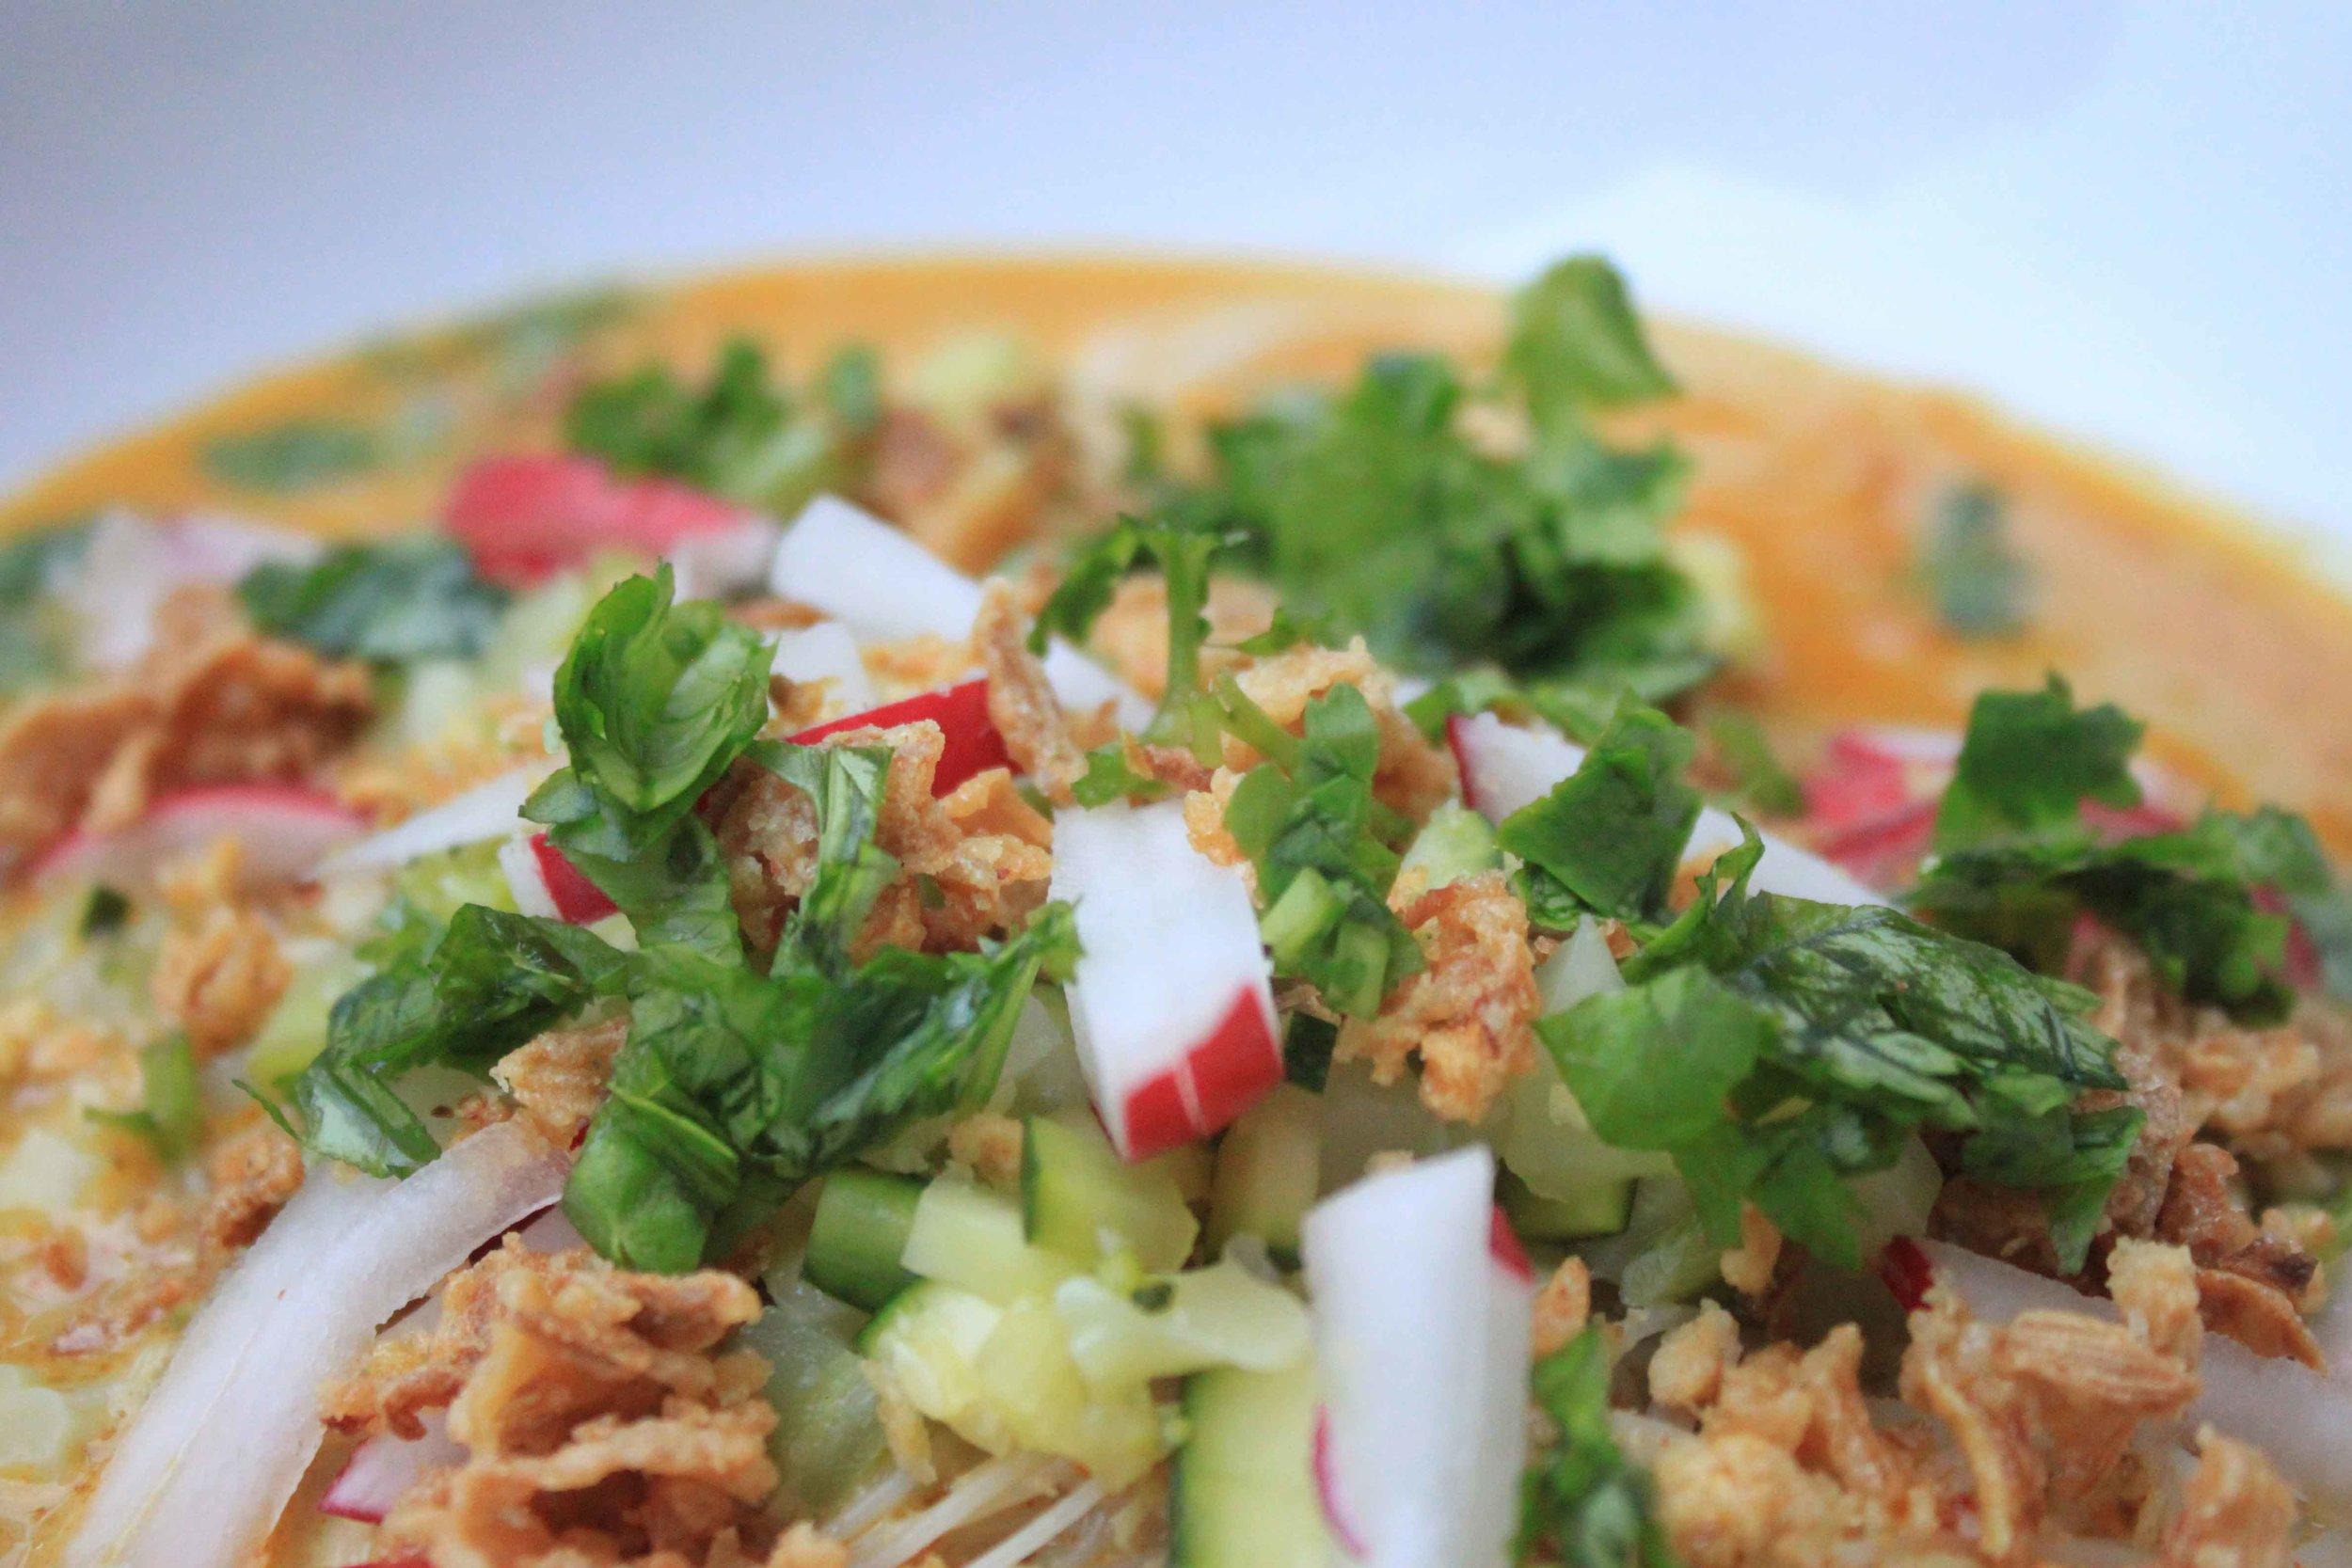 charisma shah khao soi recipe burmese coconut curry